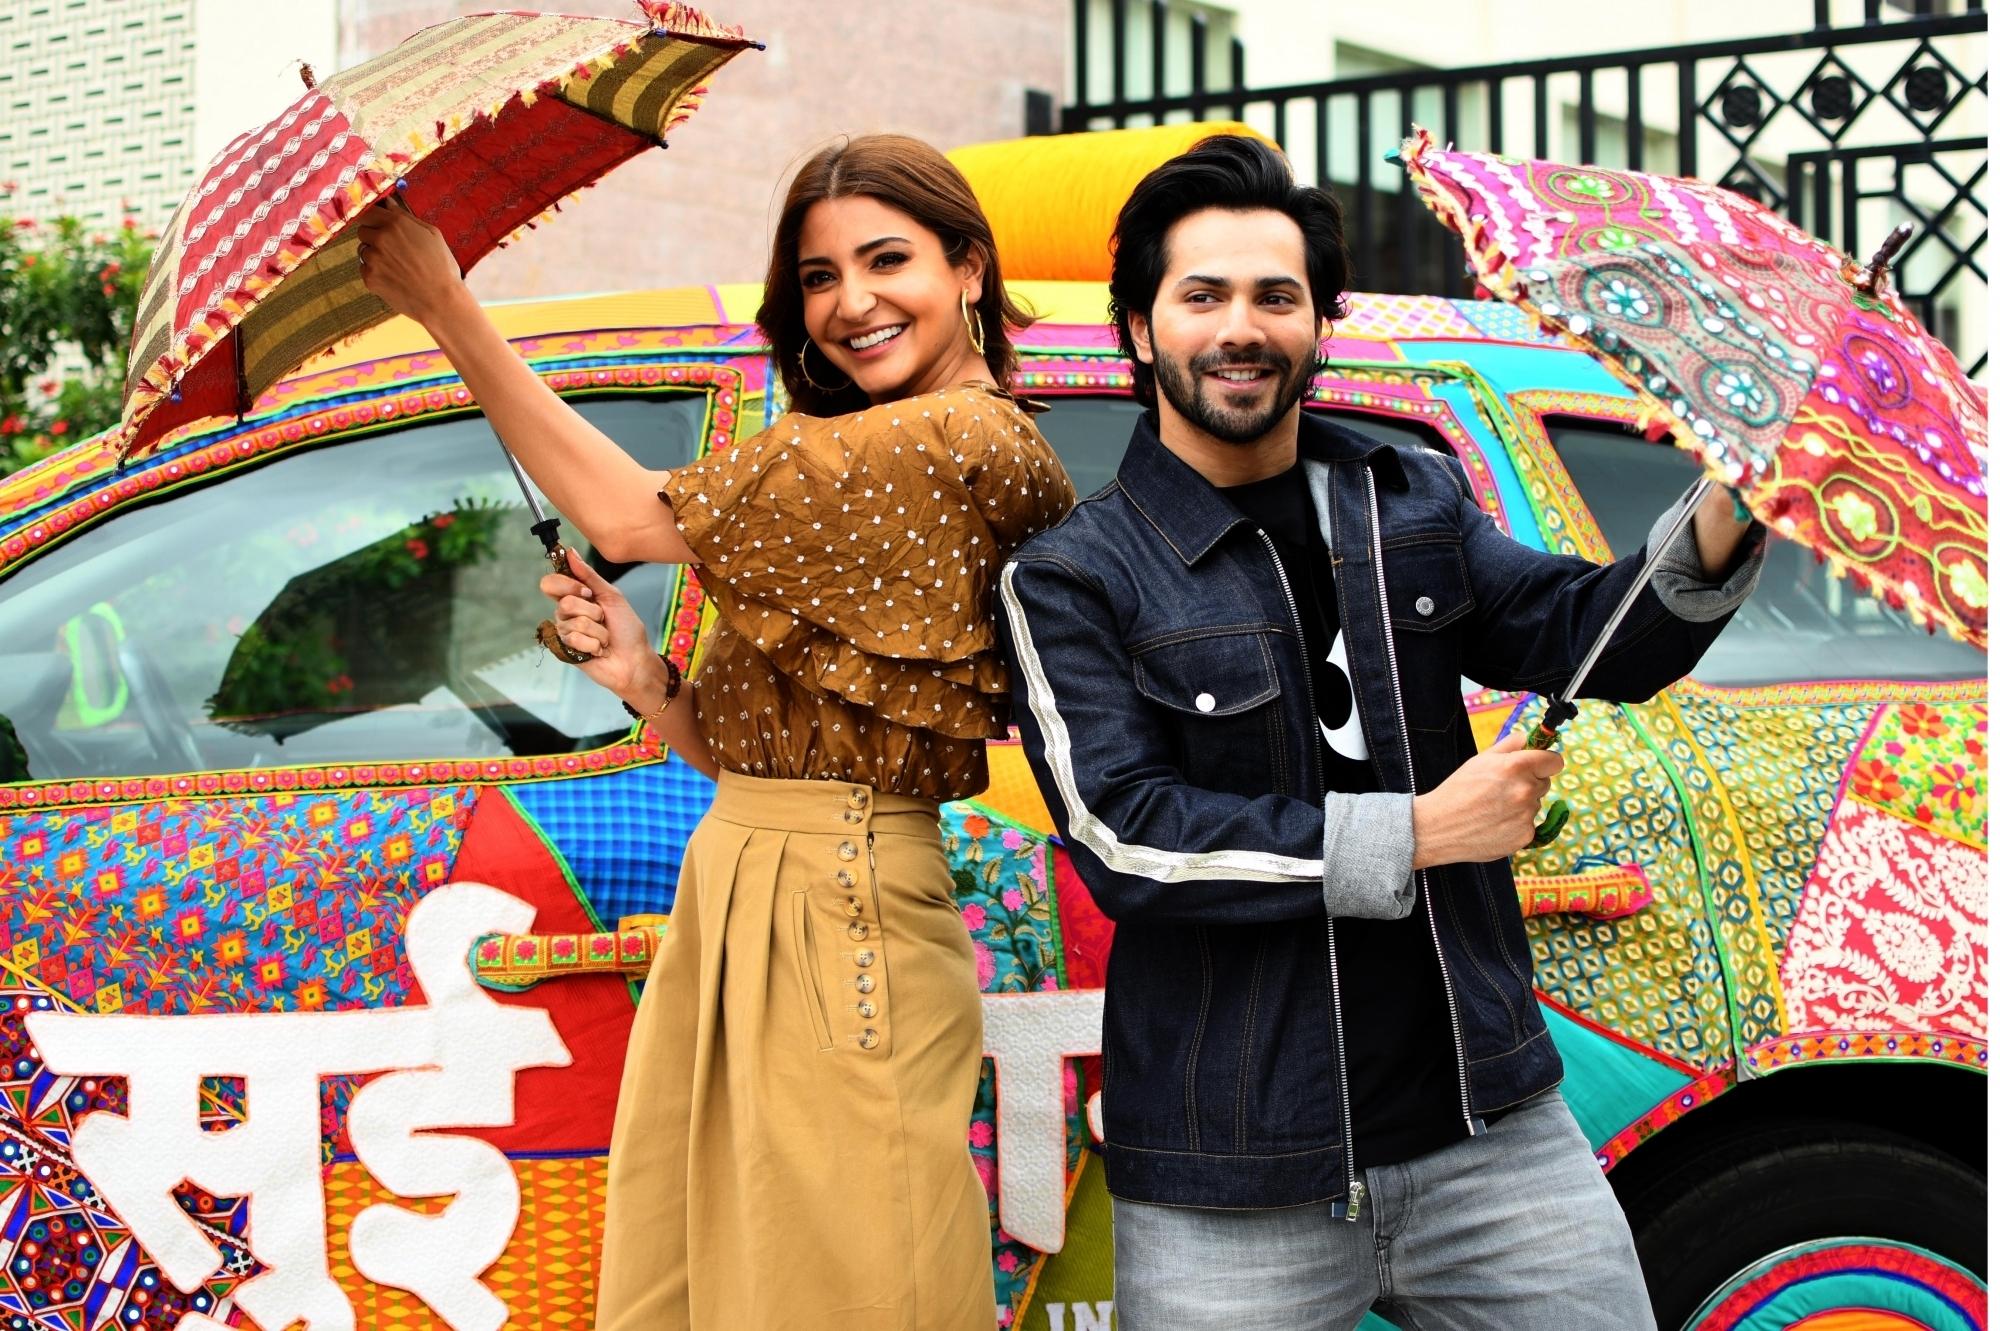 Anushka perfects 'charkha' for 'Sui Dhaaga' – Azhimukham English